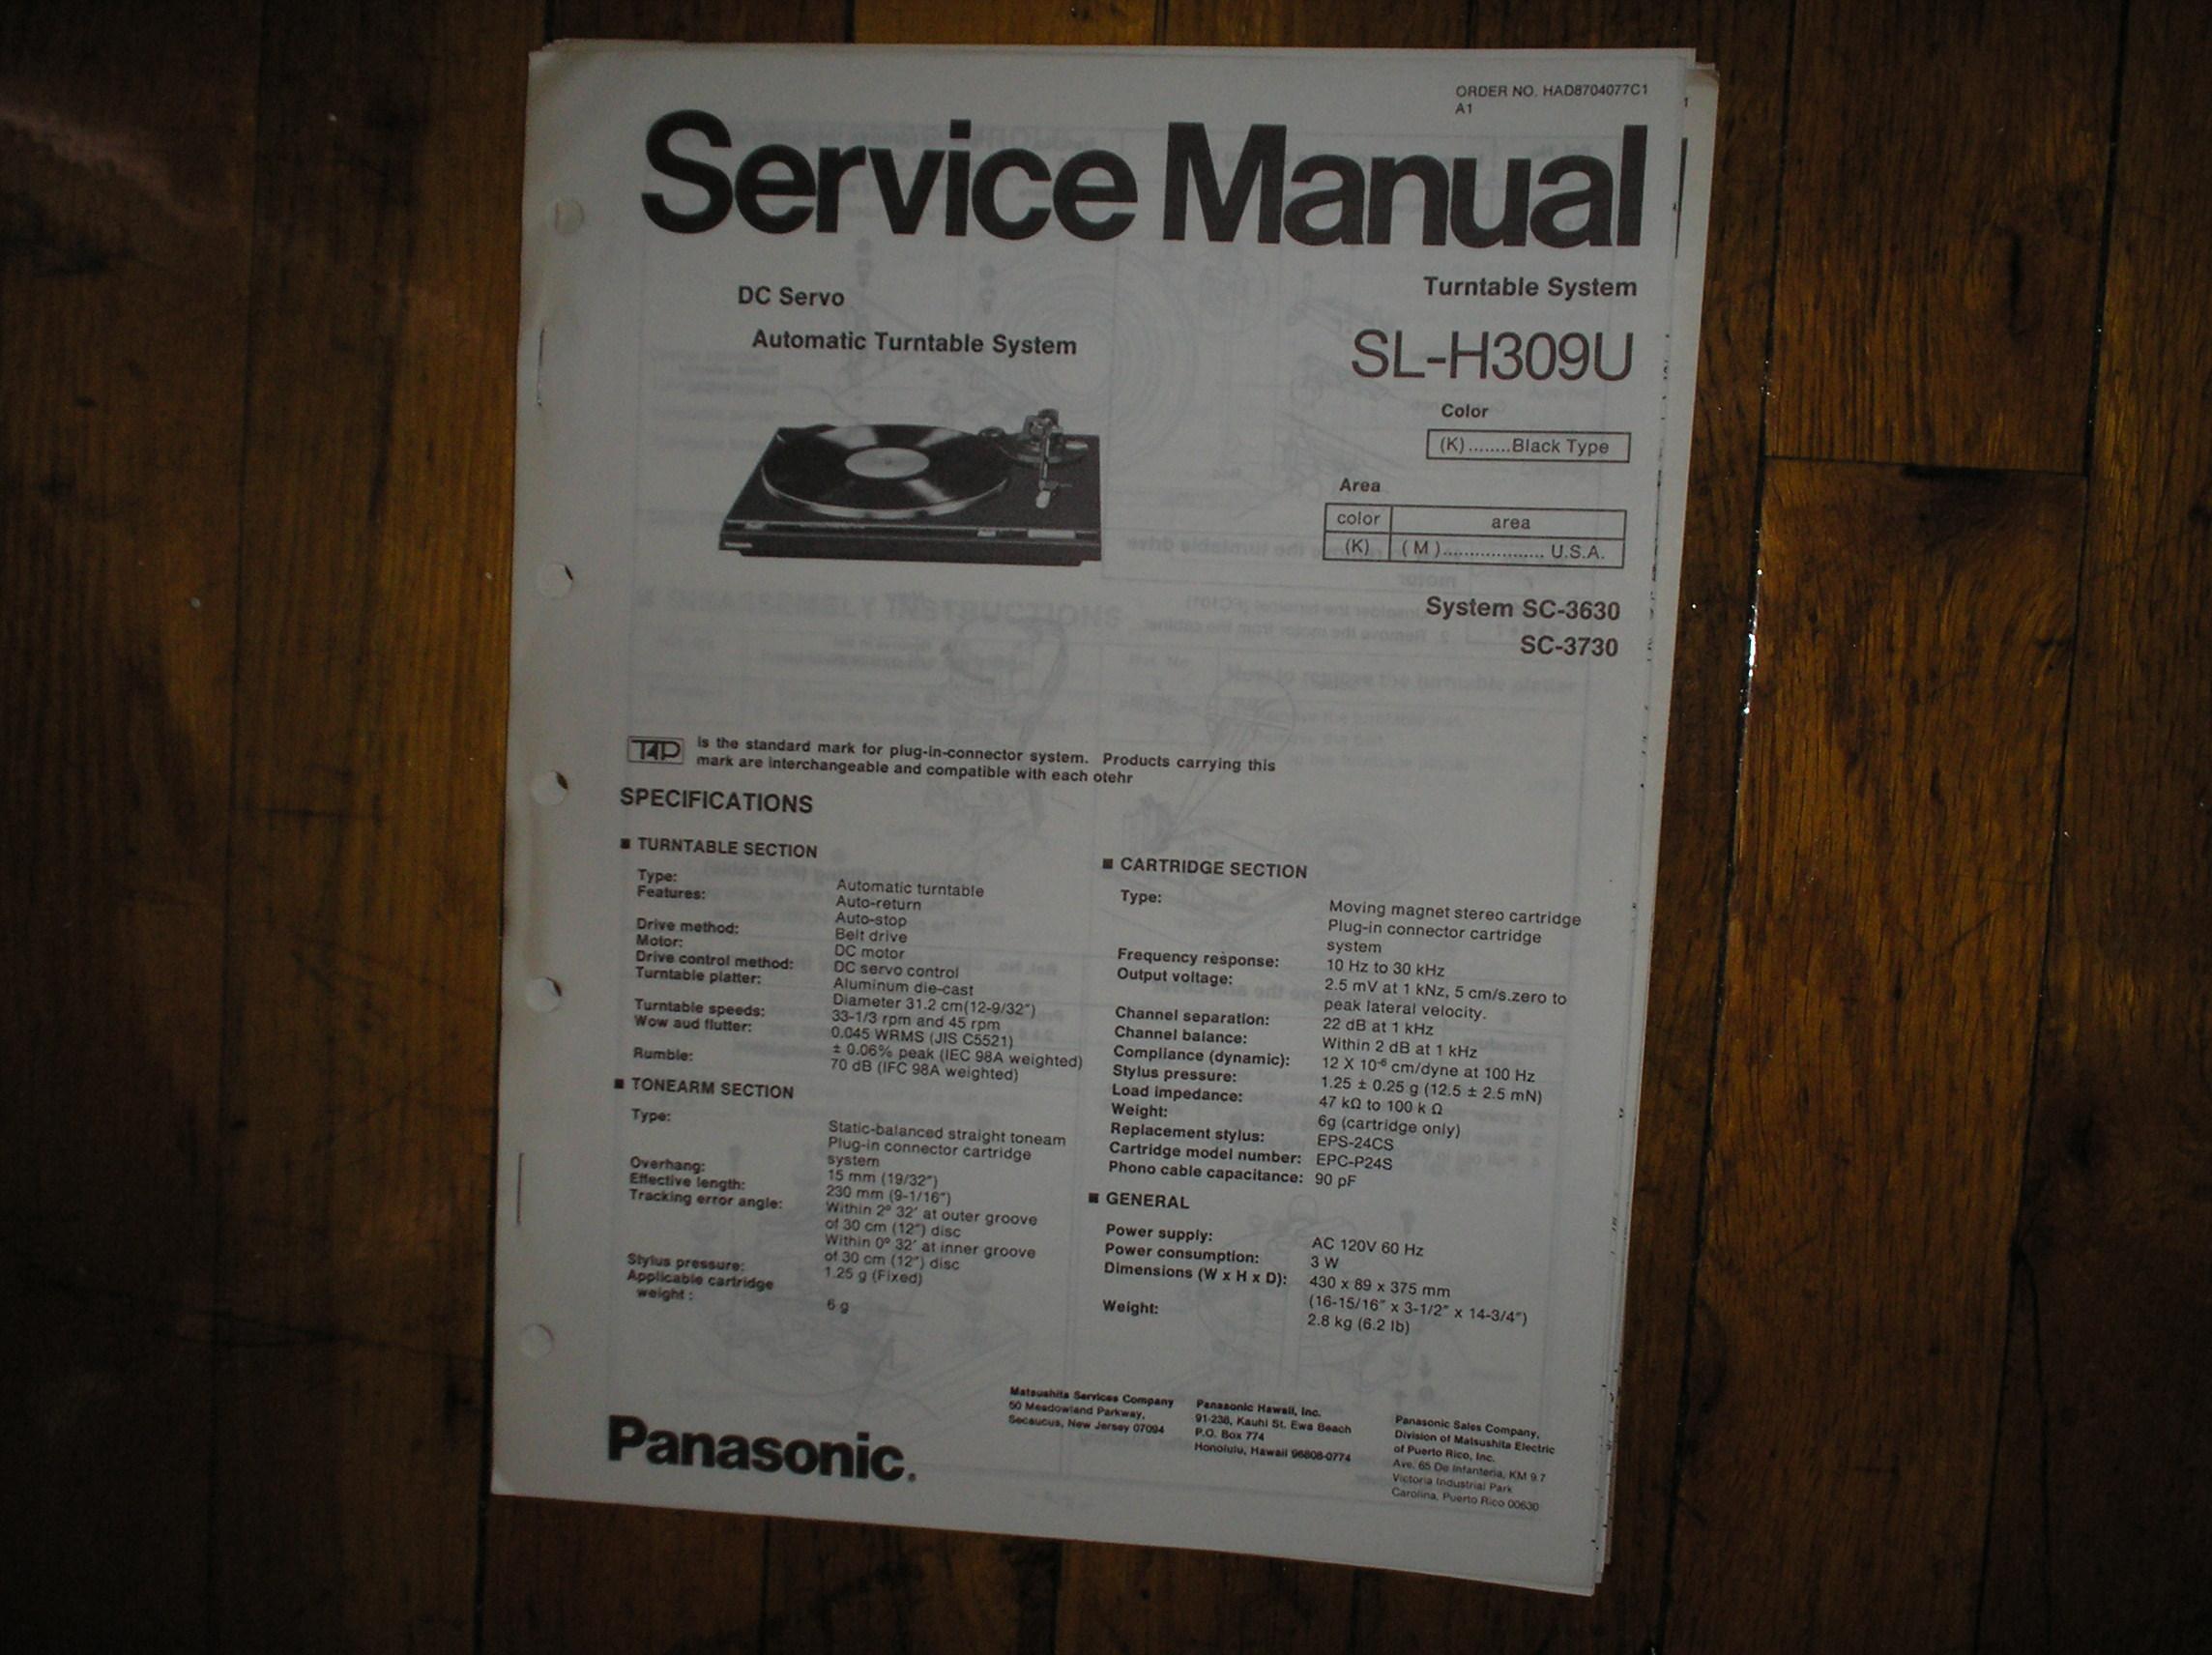 SL-H309U Turntable Service Manual